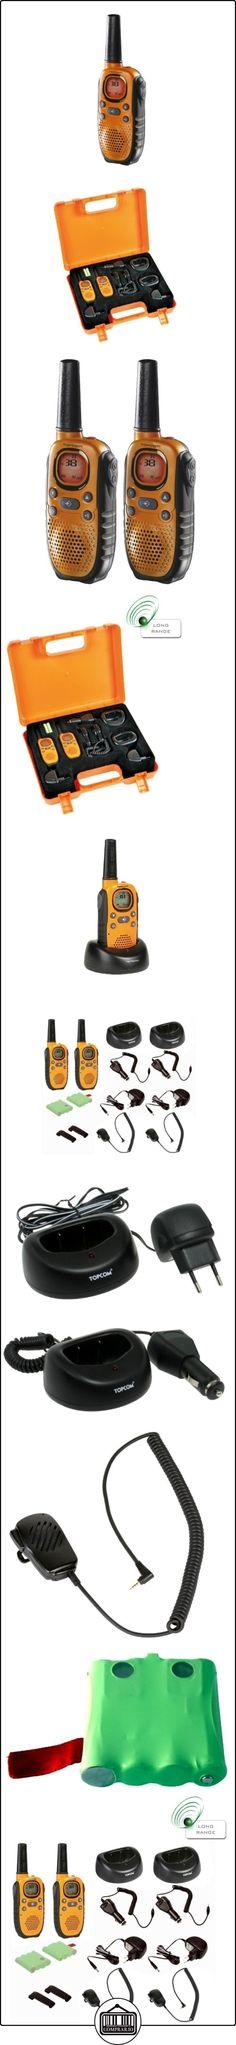 Topcom Twintalker 9100 Long Range - Walkie-talkie  ✿ Vigilabebés - Seguridad ✿ ▬► Ver oferta: http://comprar.io/goto/B000K6AWT8